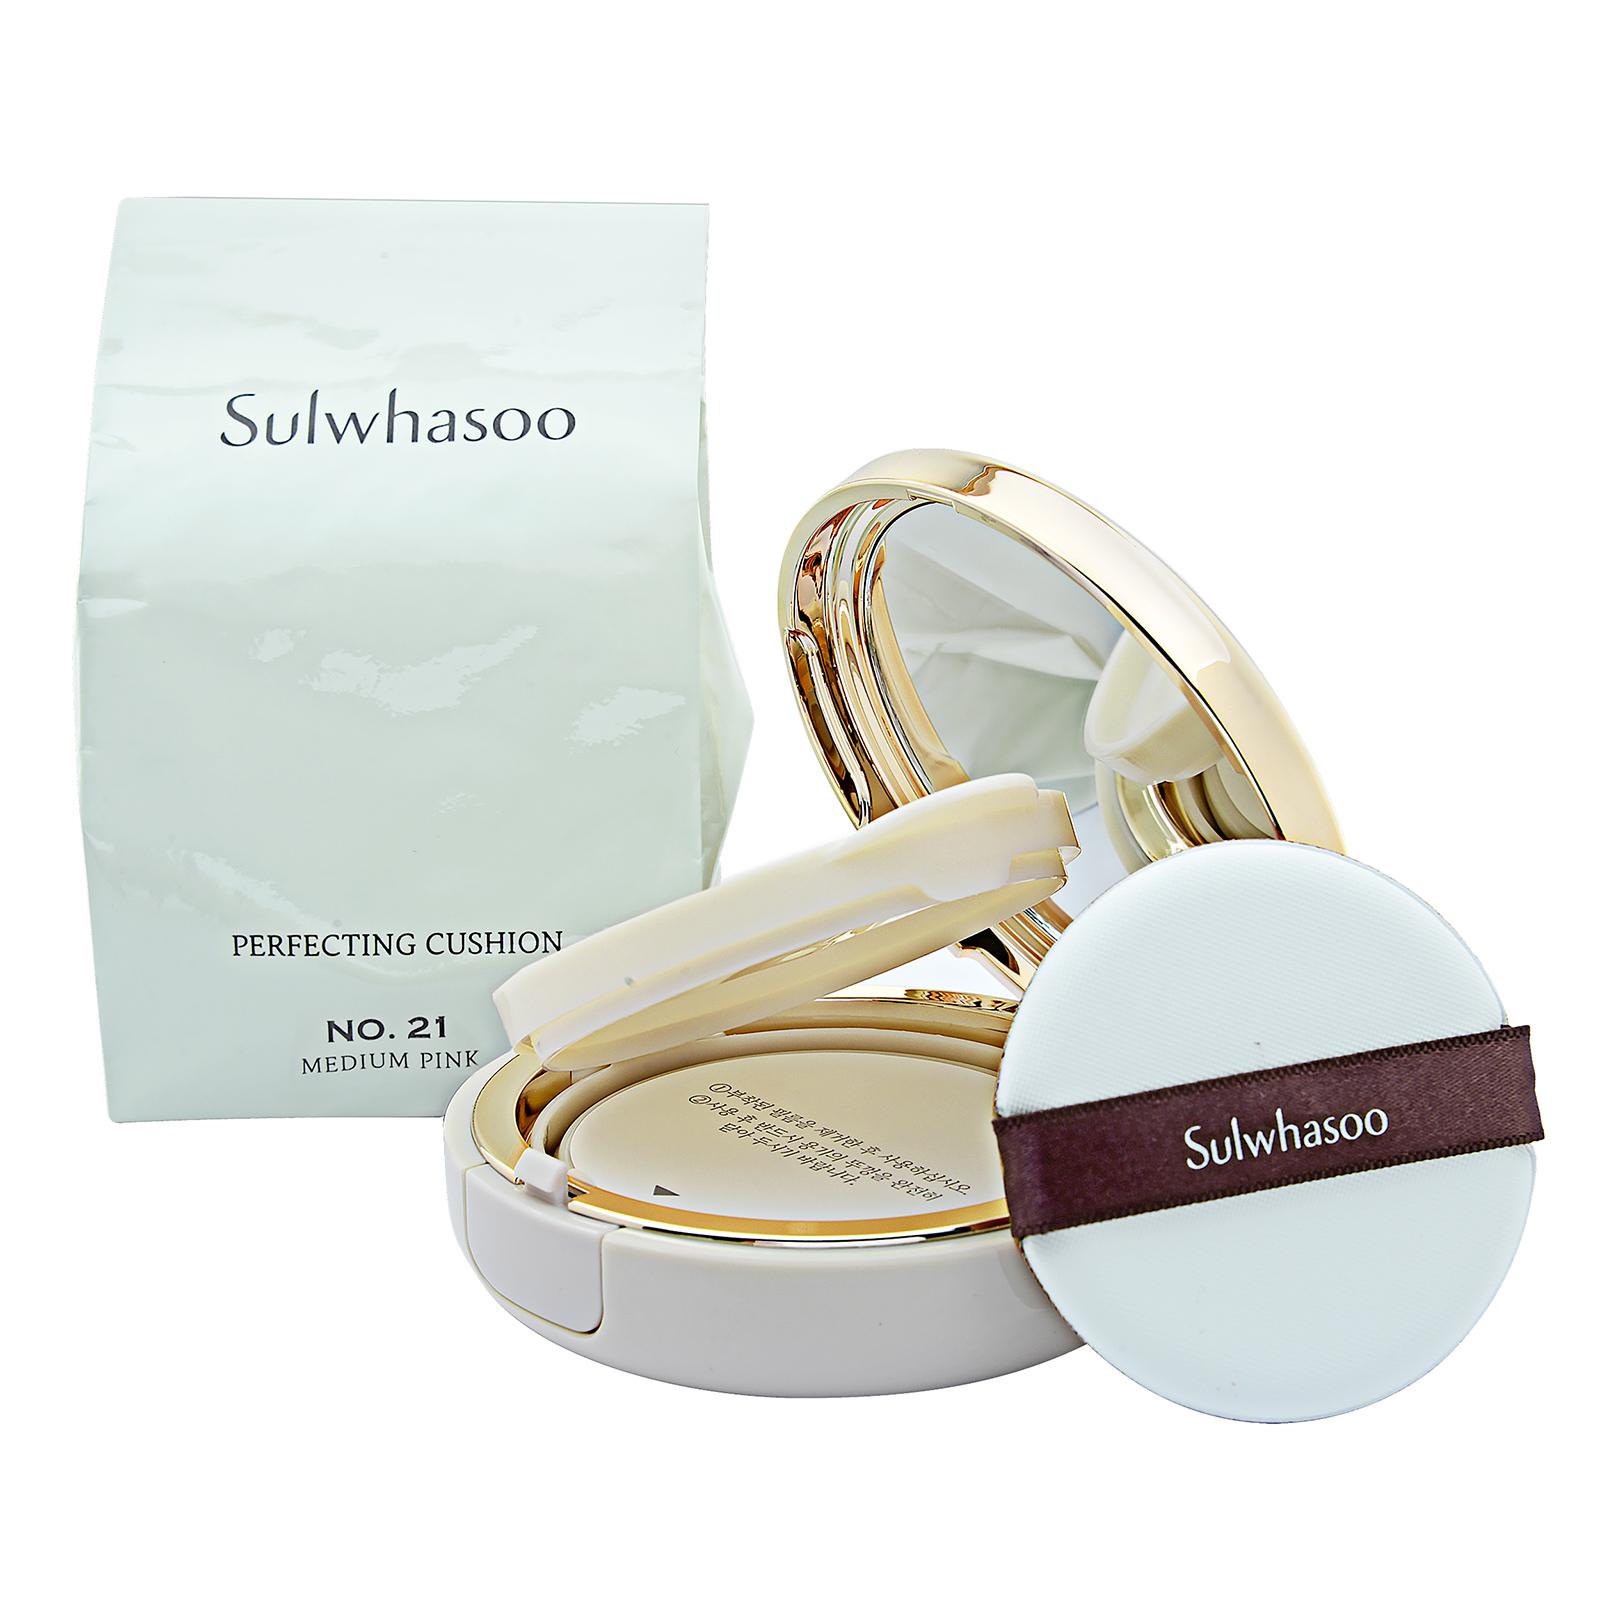 Sulwhasoo Perfecting Cushion SPF50+ / PA+++ No. 21 Medium Pink, 2 x 15g,